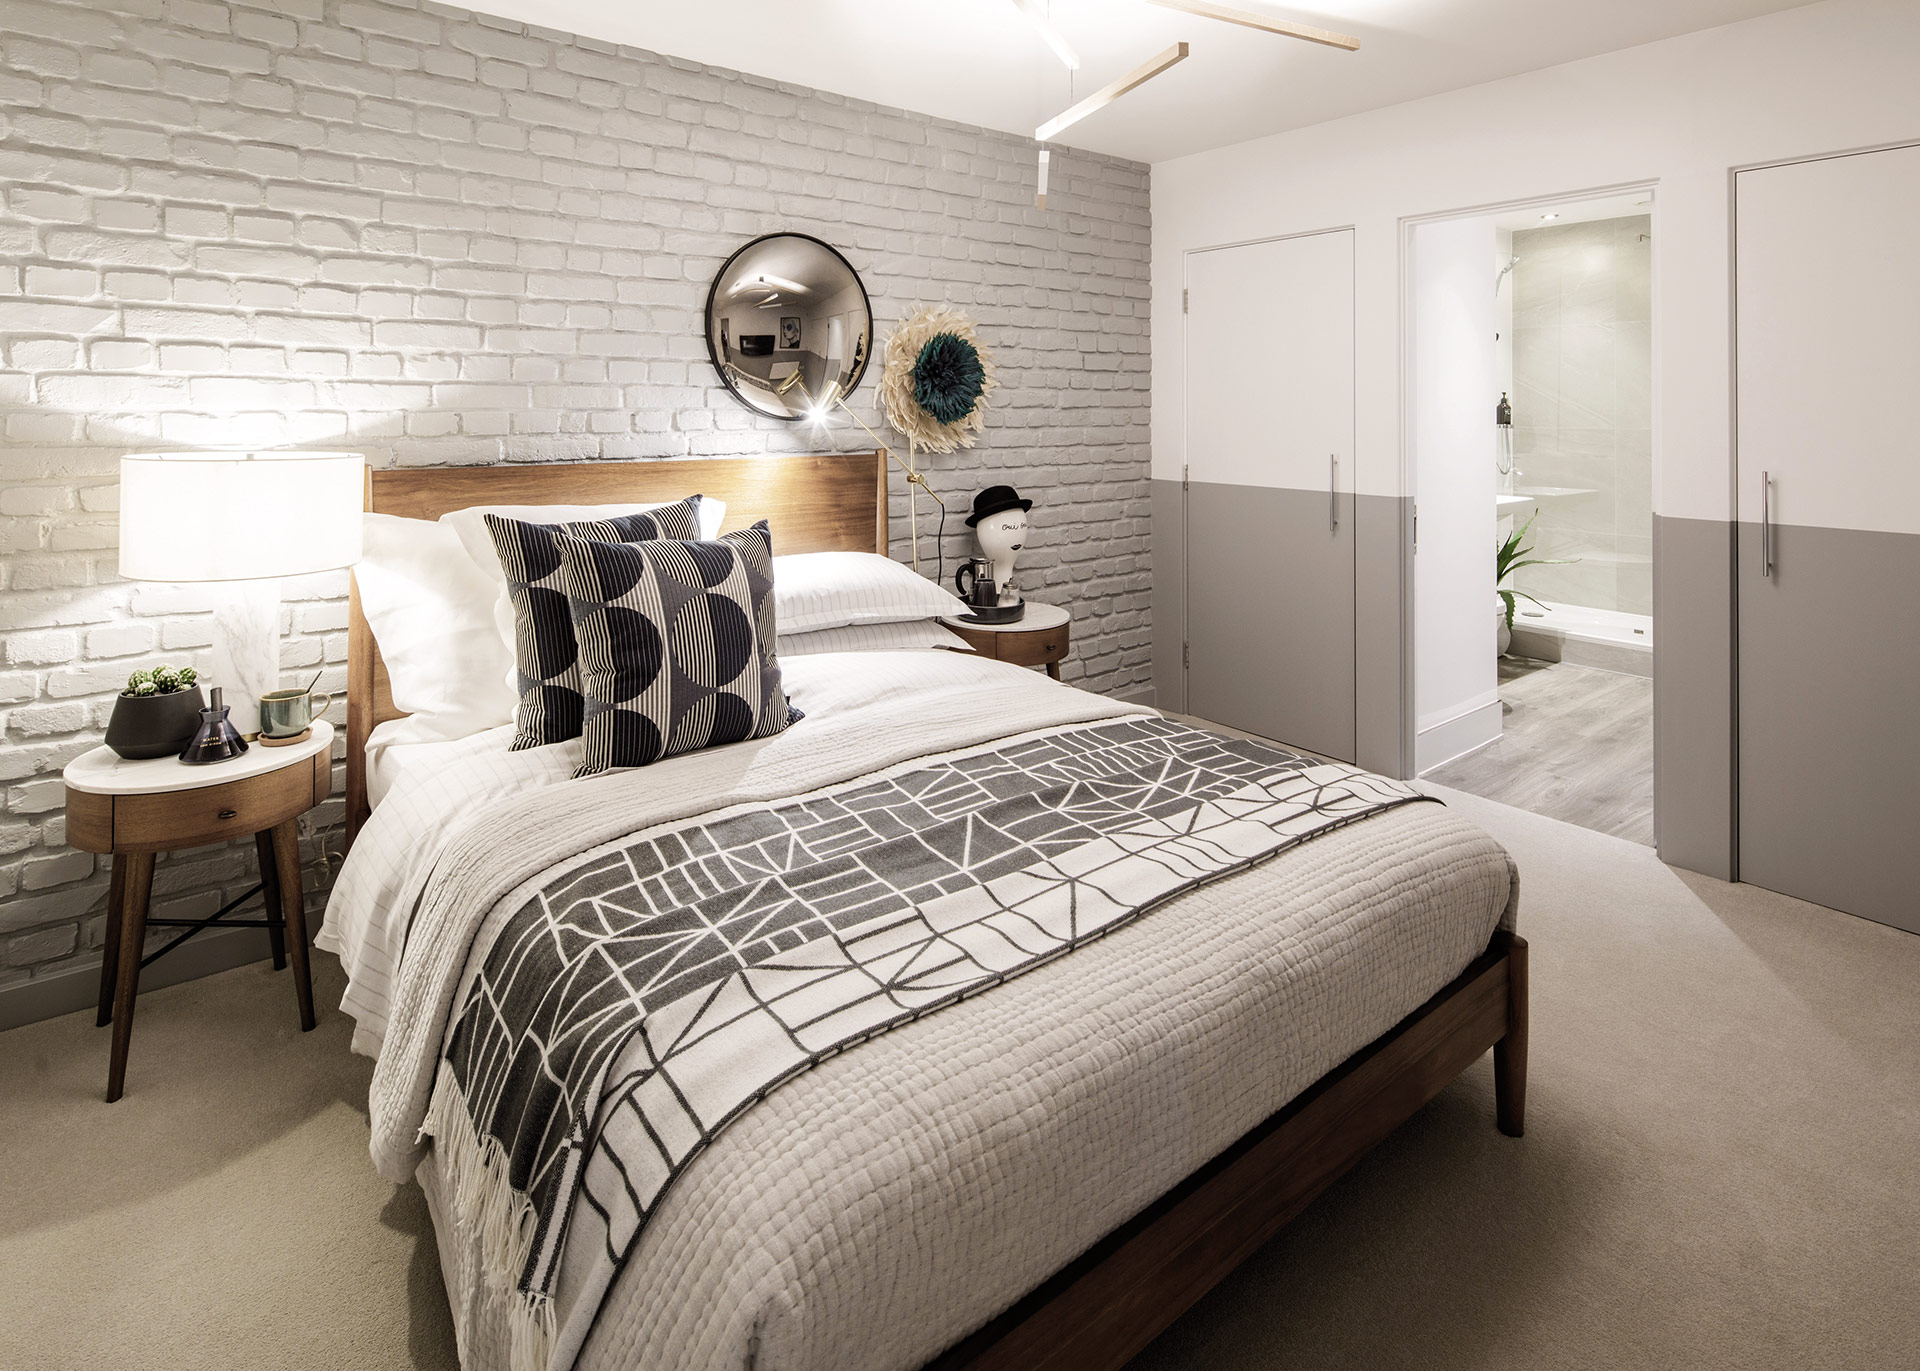 Metropol bedroom